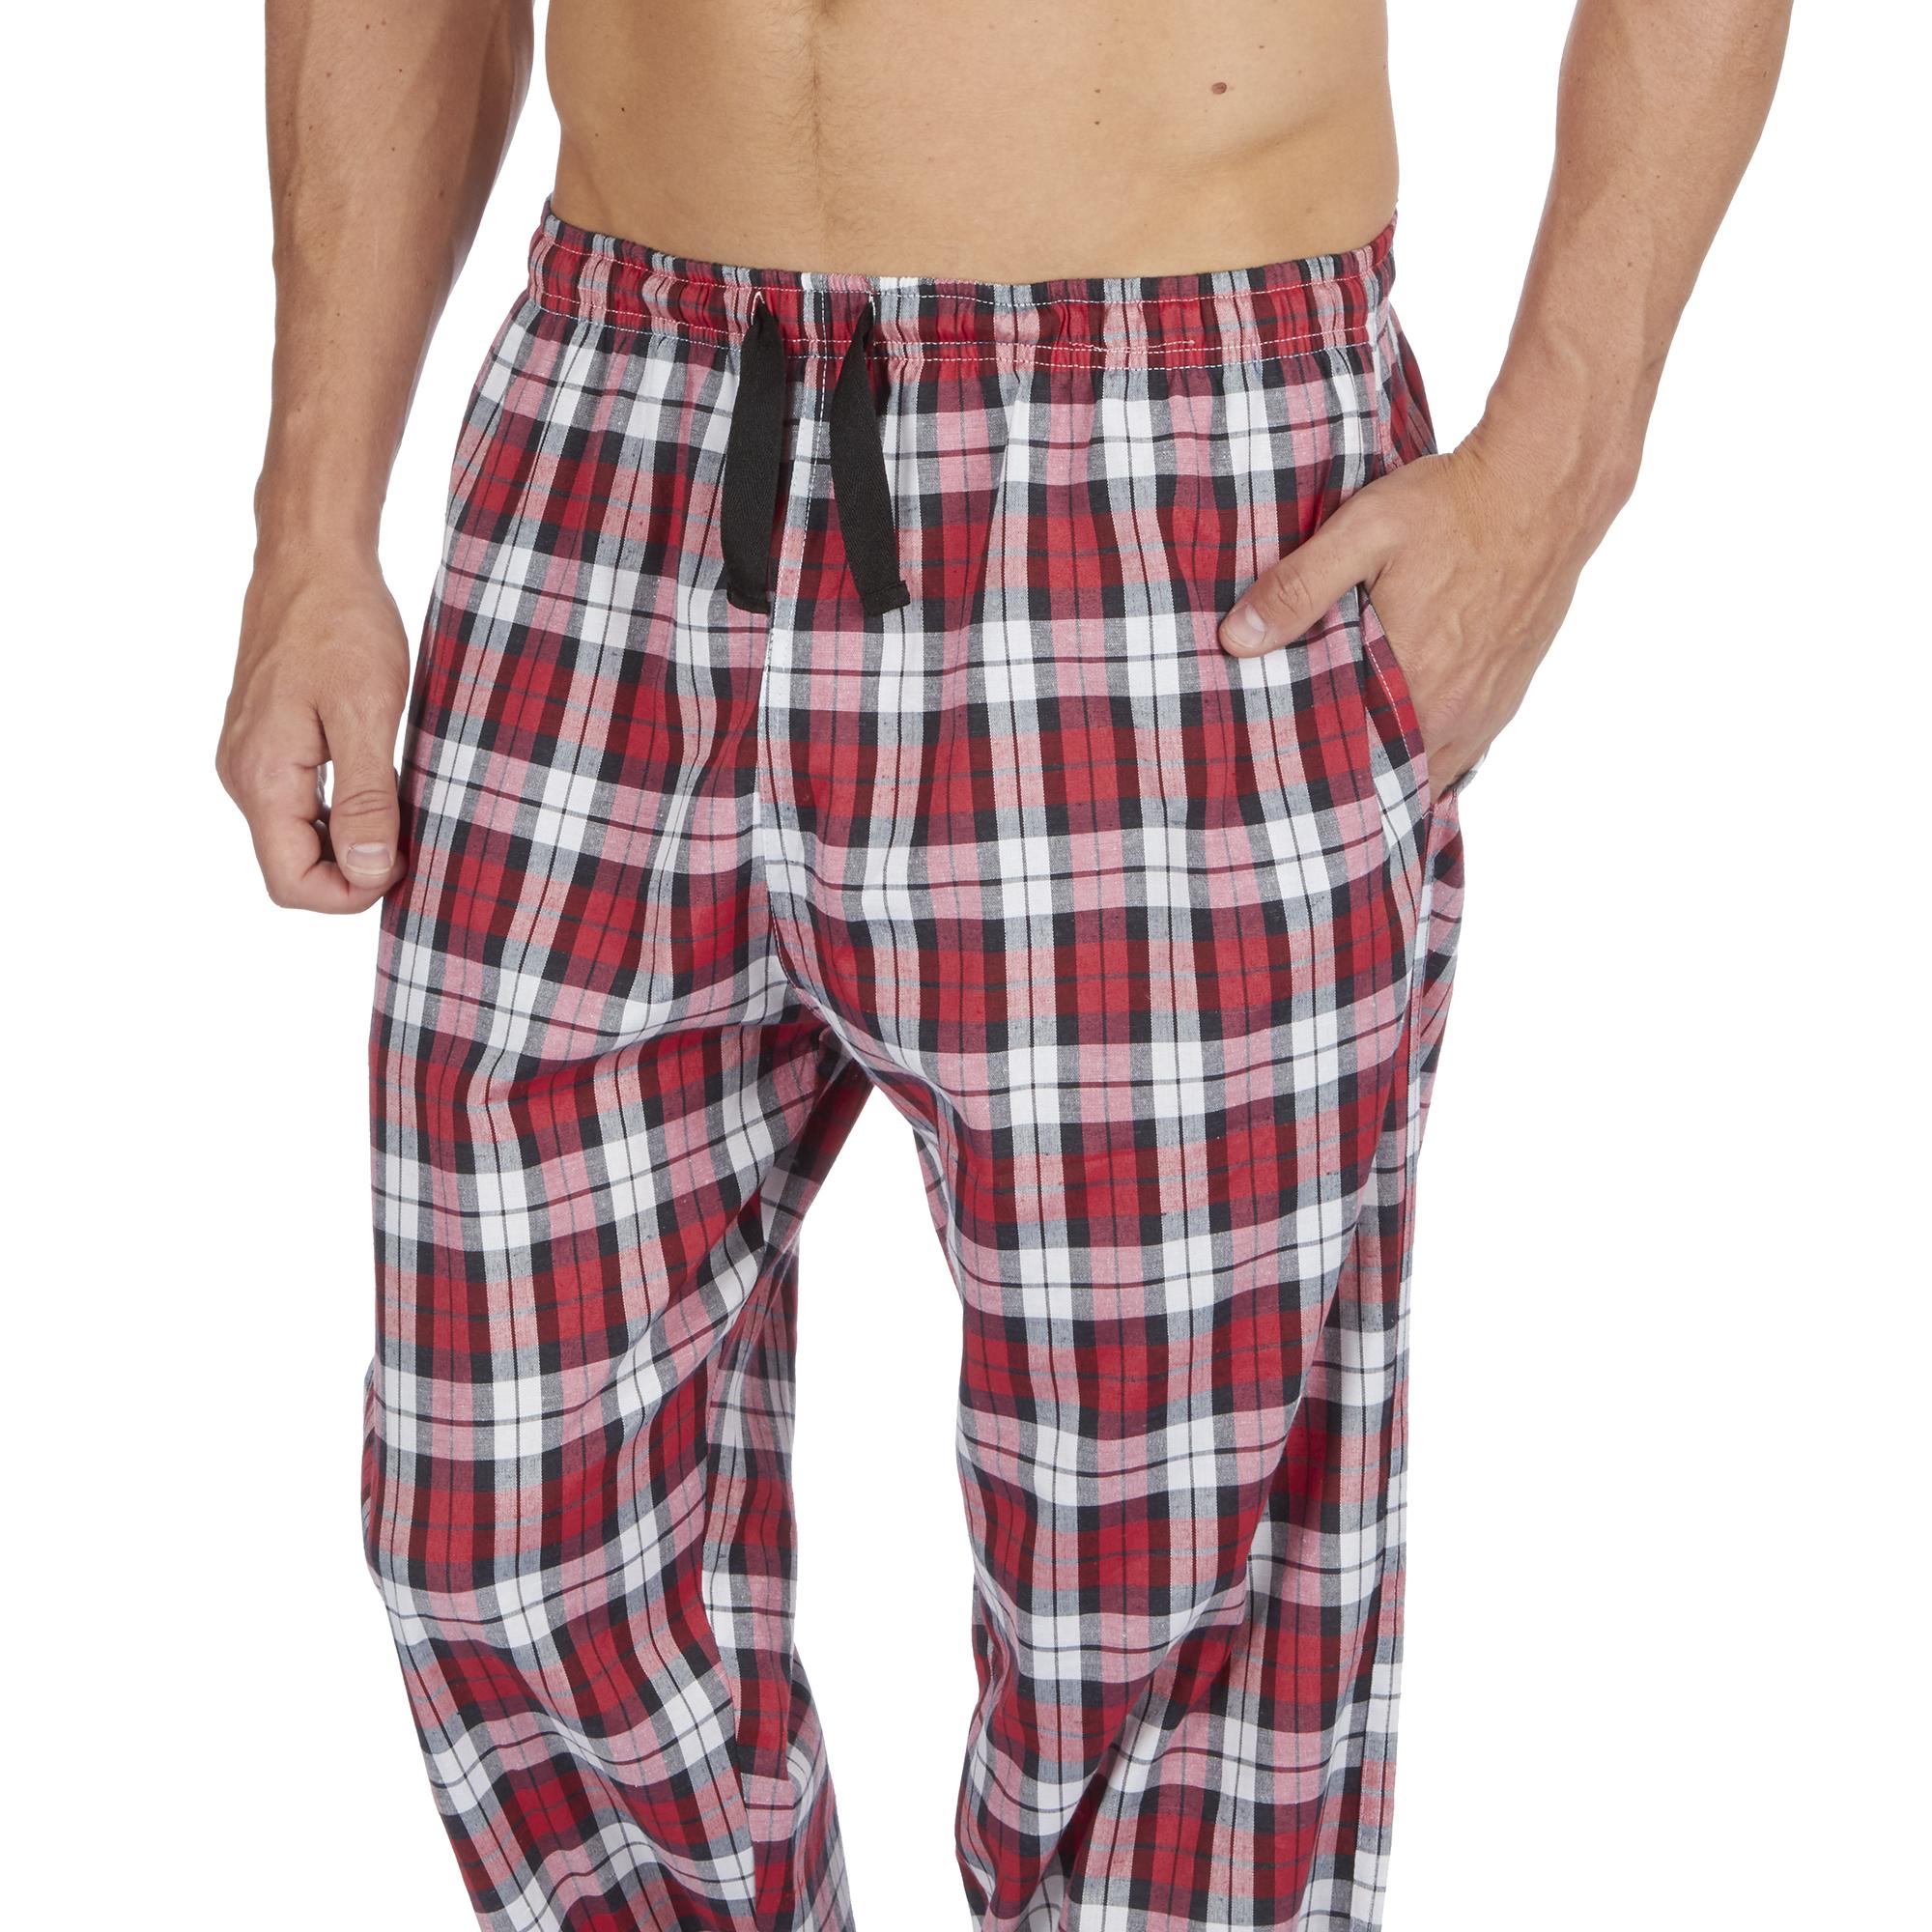 Jason-Jones-Homme-Carreaux-Tisse-Pyjama-Pantalon-en-Coton-Melange-Serge-PJ-Lounge-Pants miniature 28